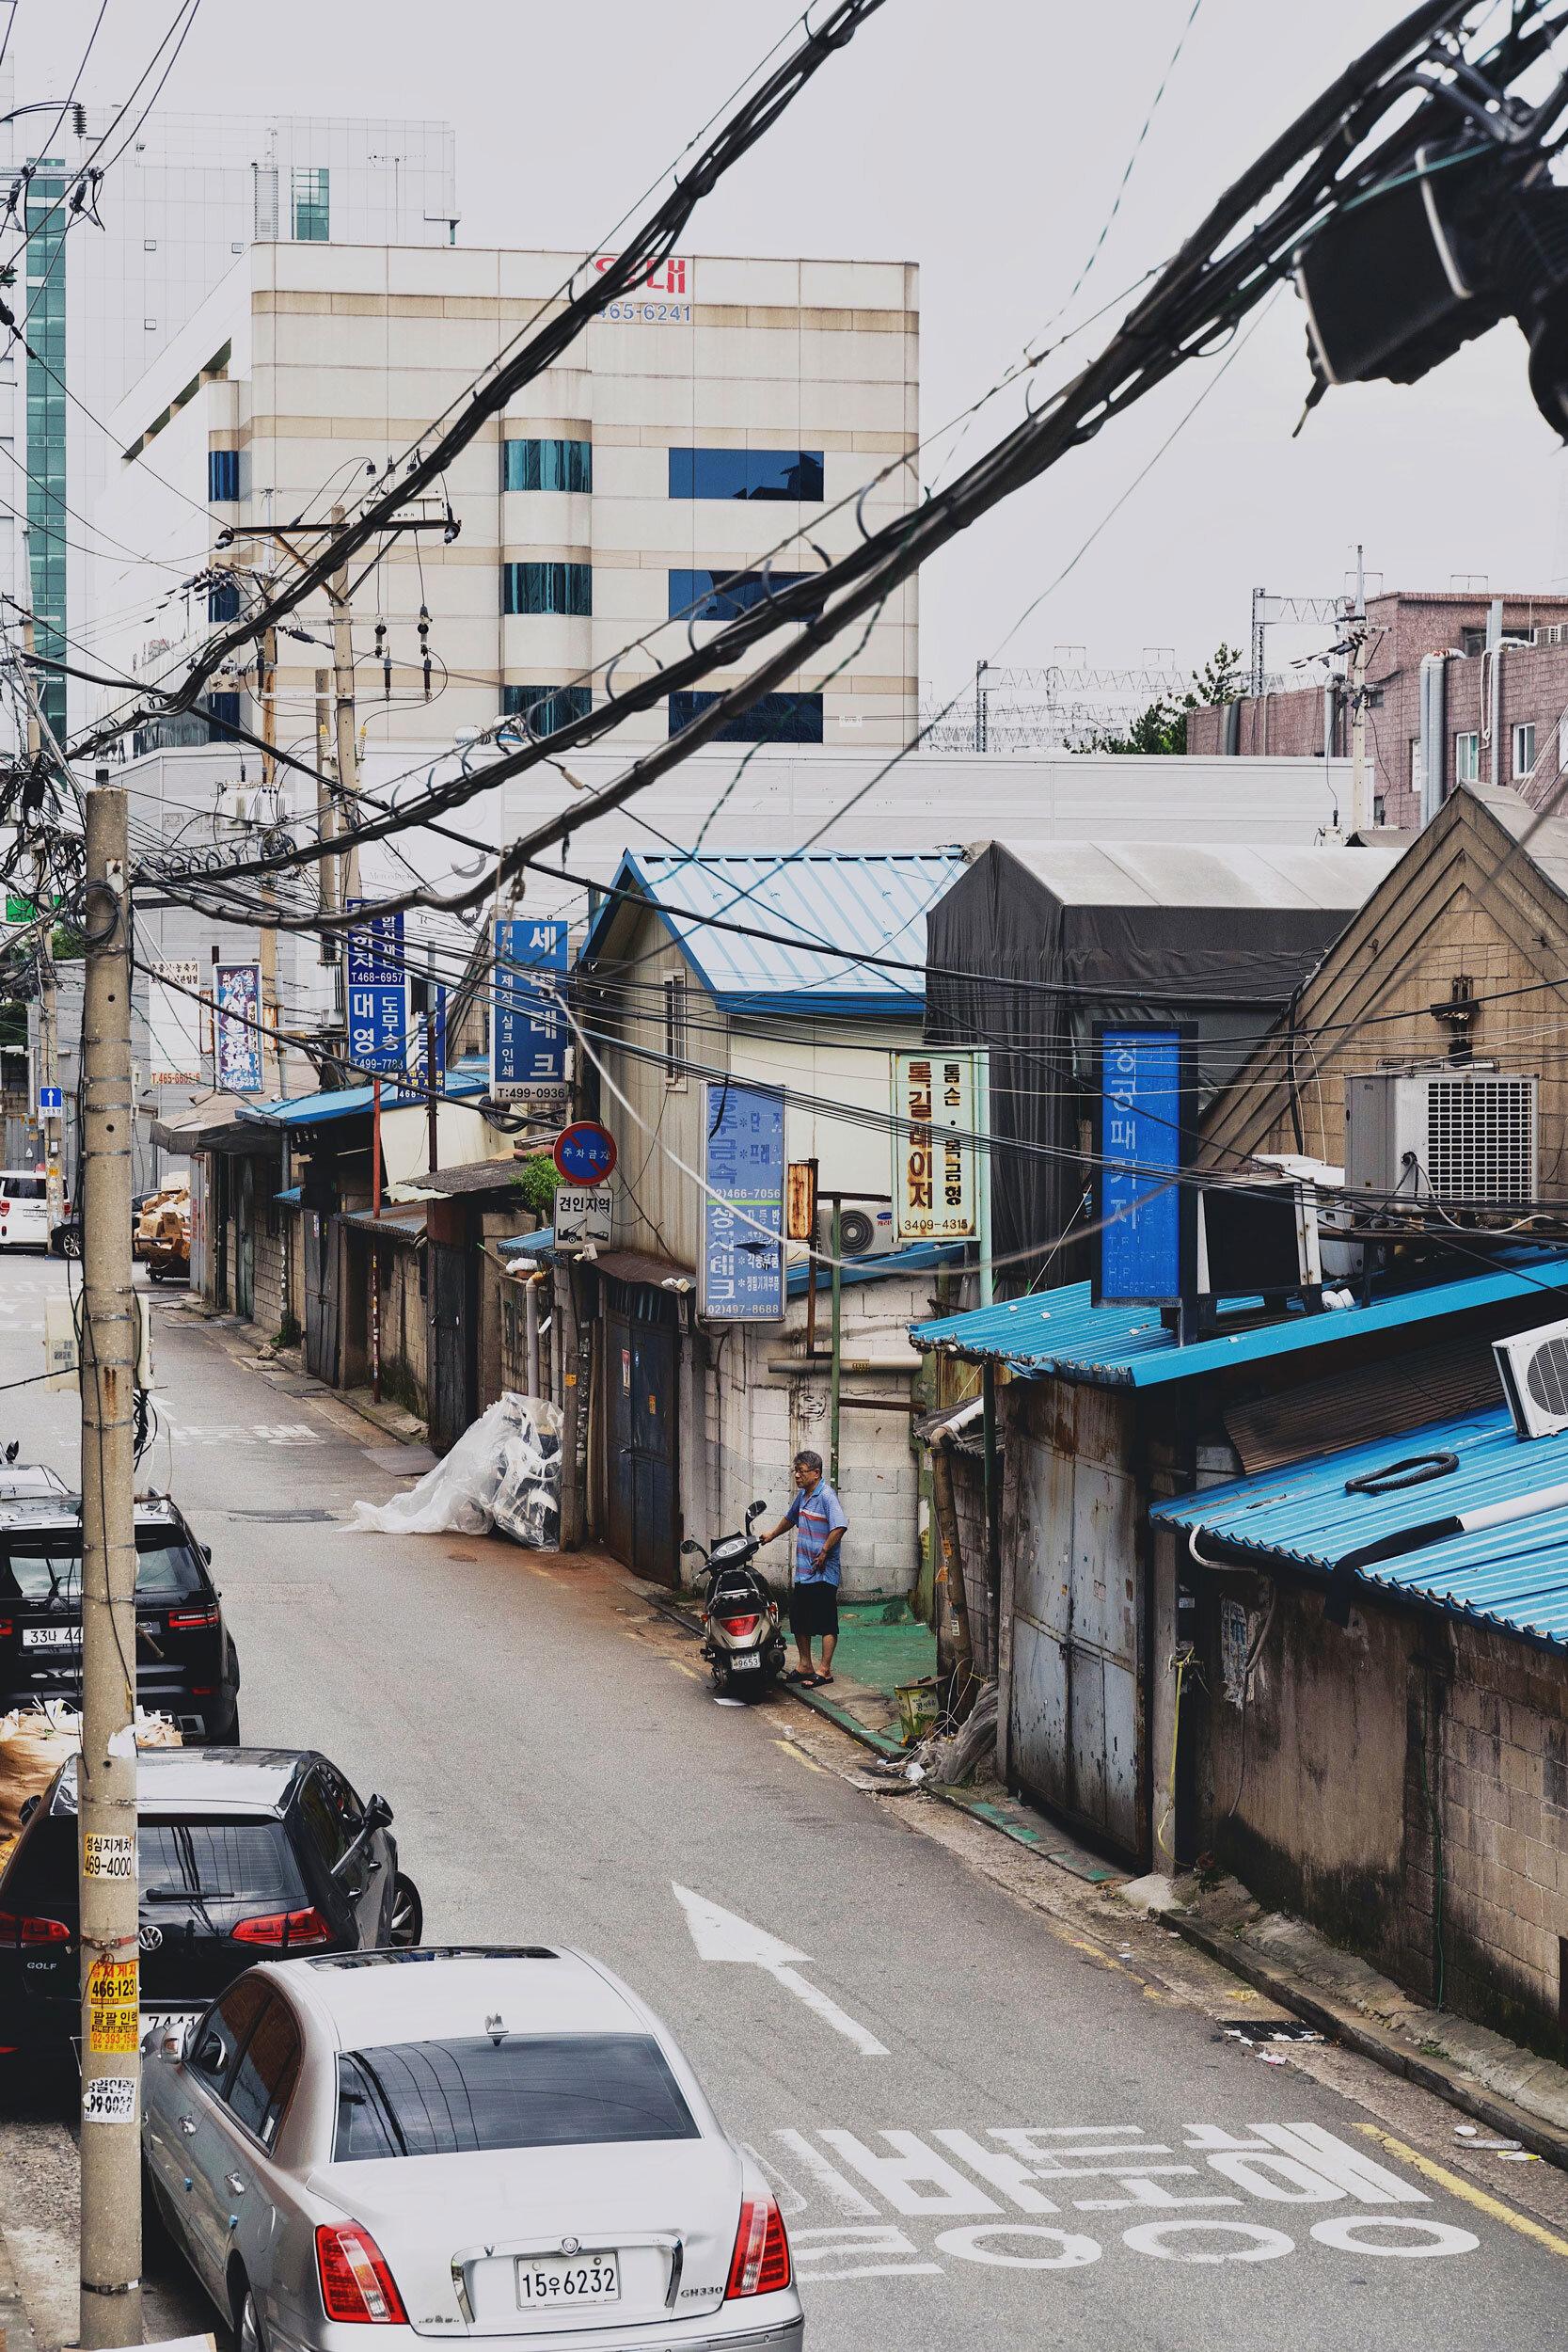 The industrial turned trendy area of Seongsu